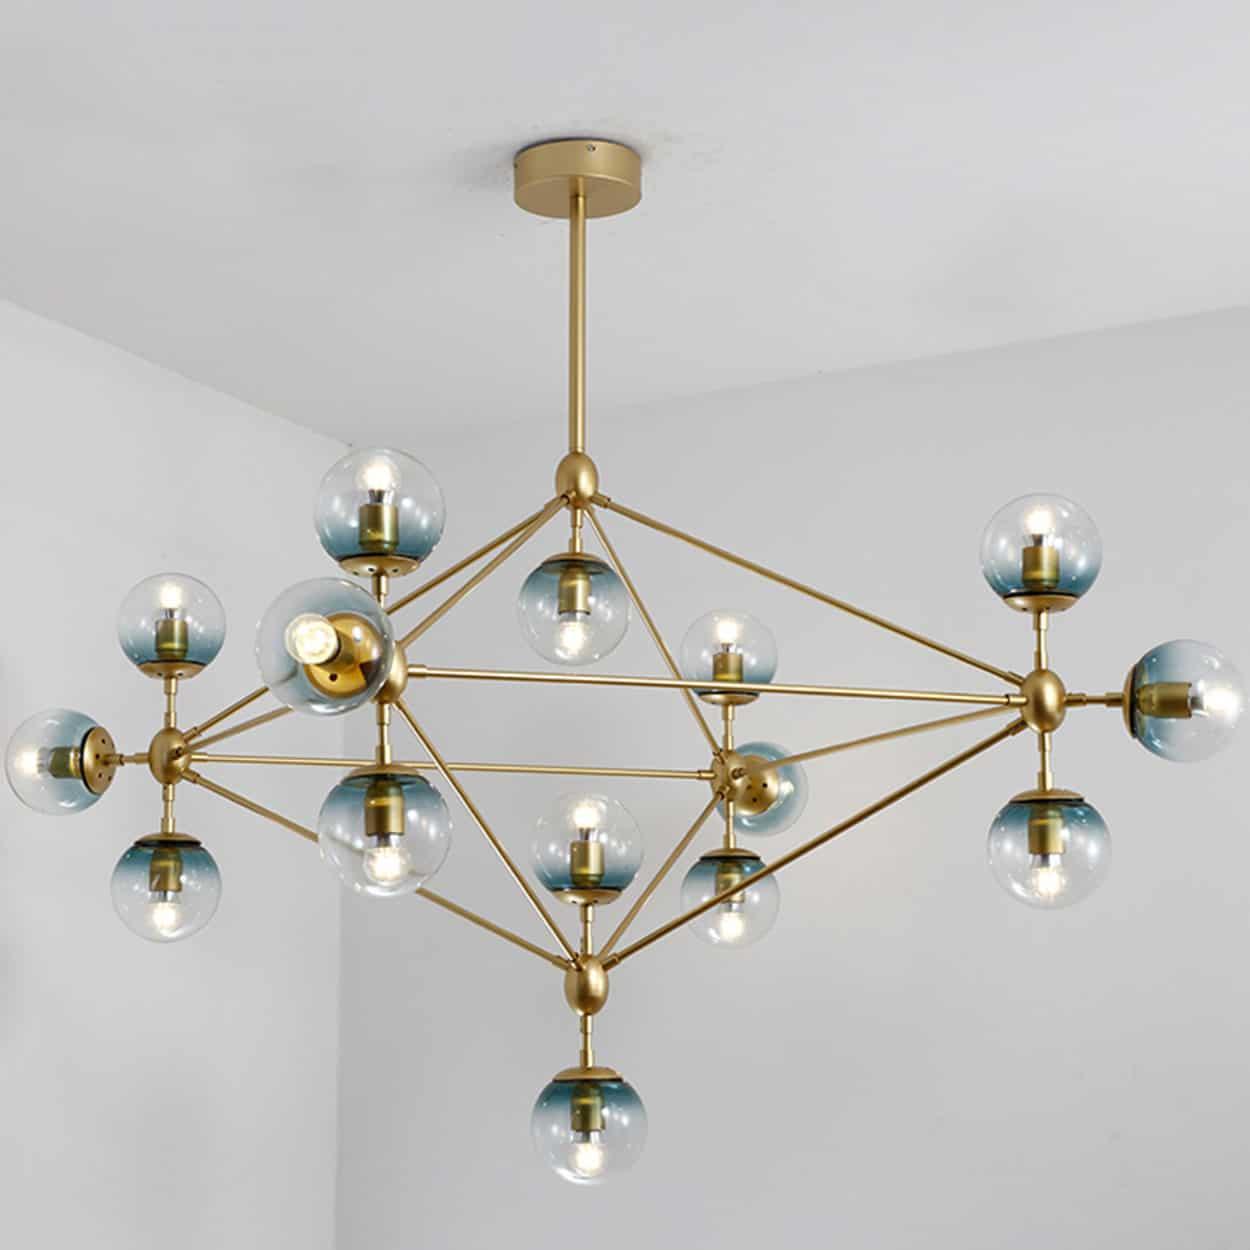 Elovold glass ball atomic pendant lamp